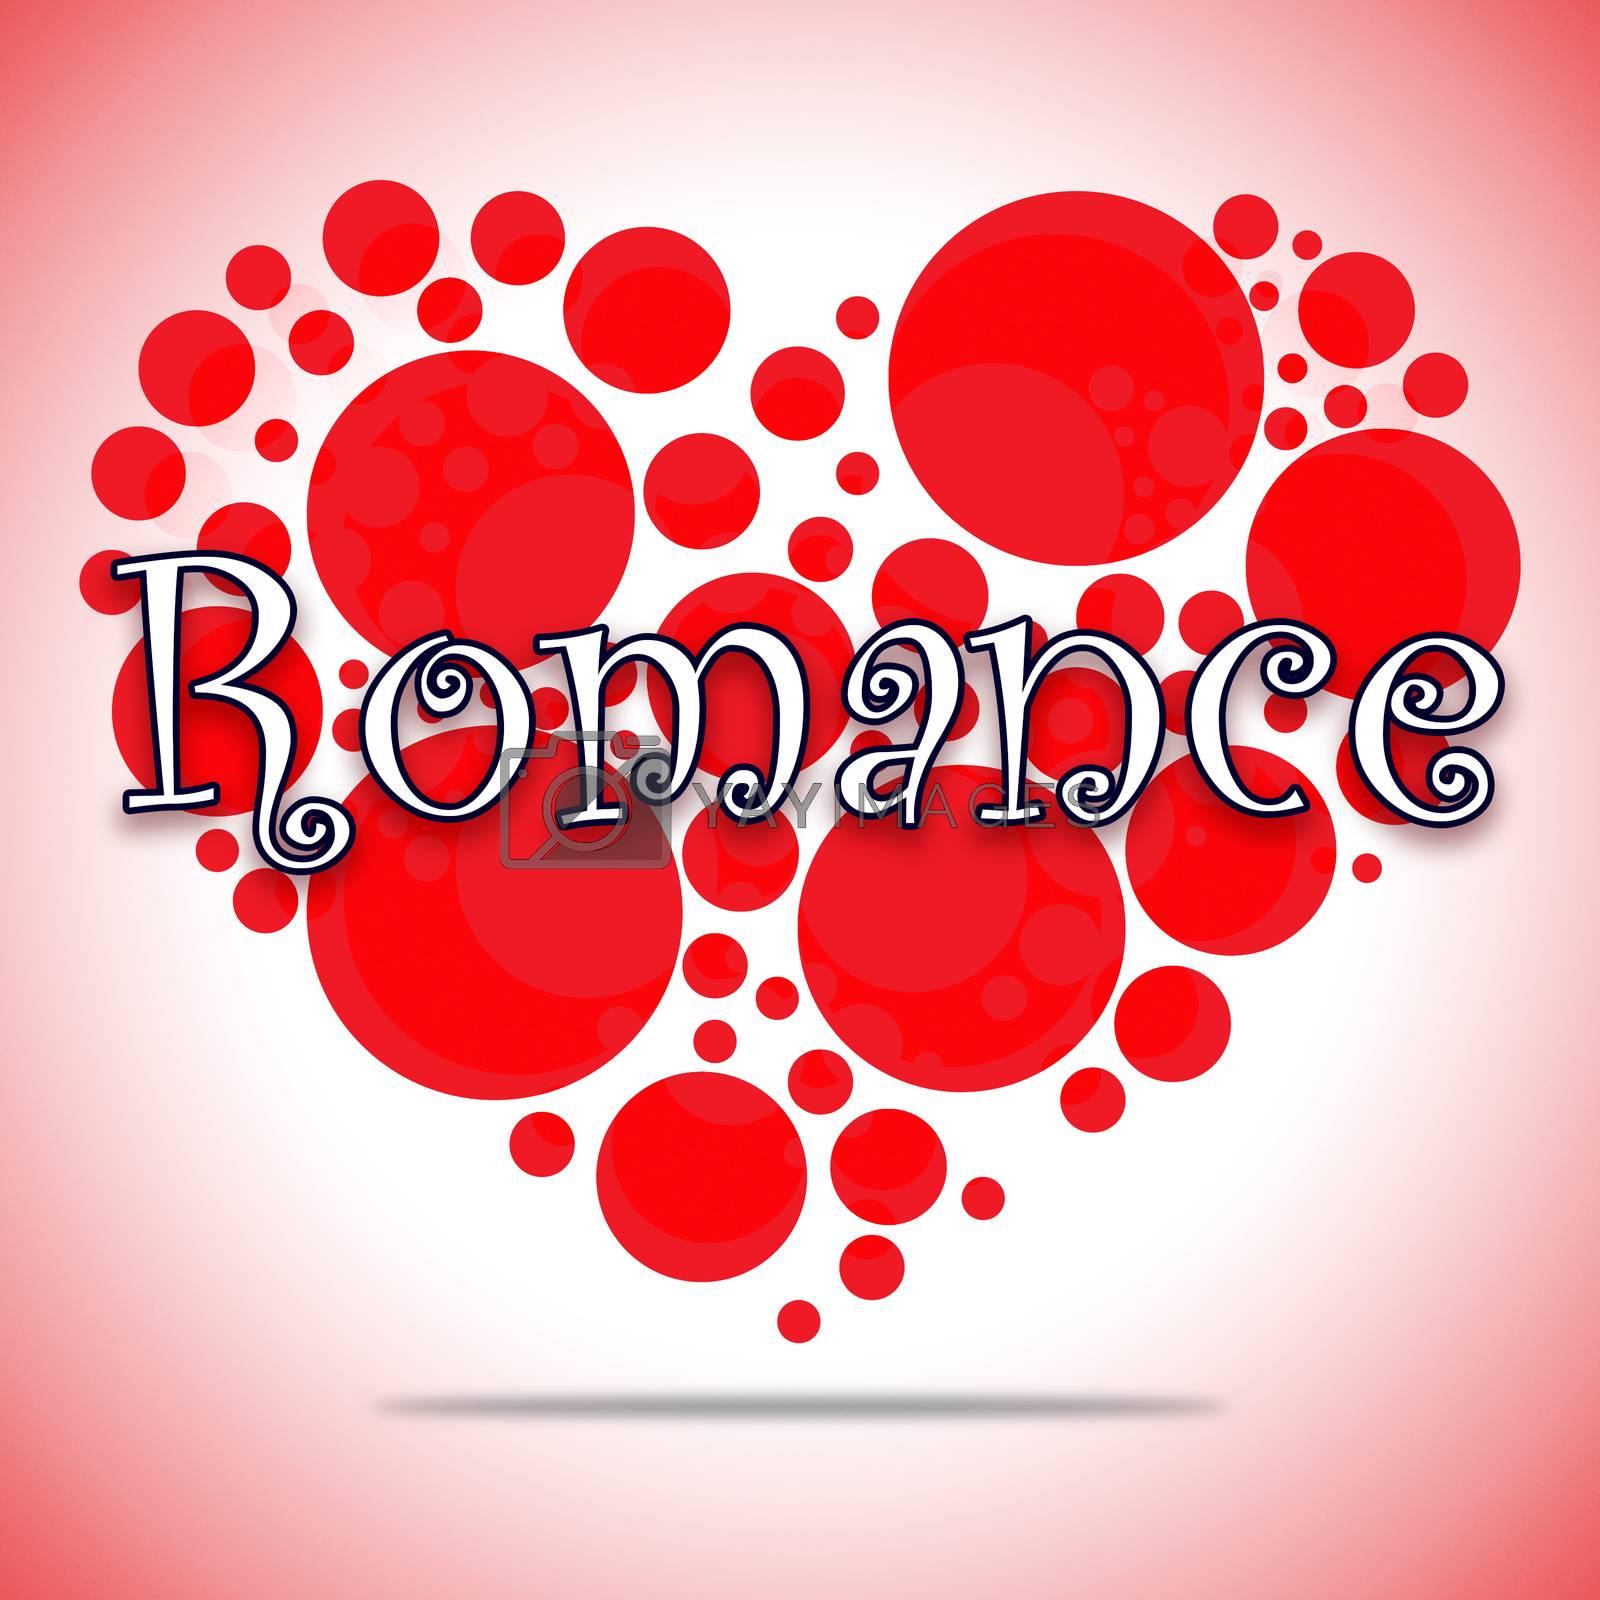 Romance Hearts Shows Love Romance And Celebration by stuartmiles